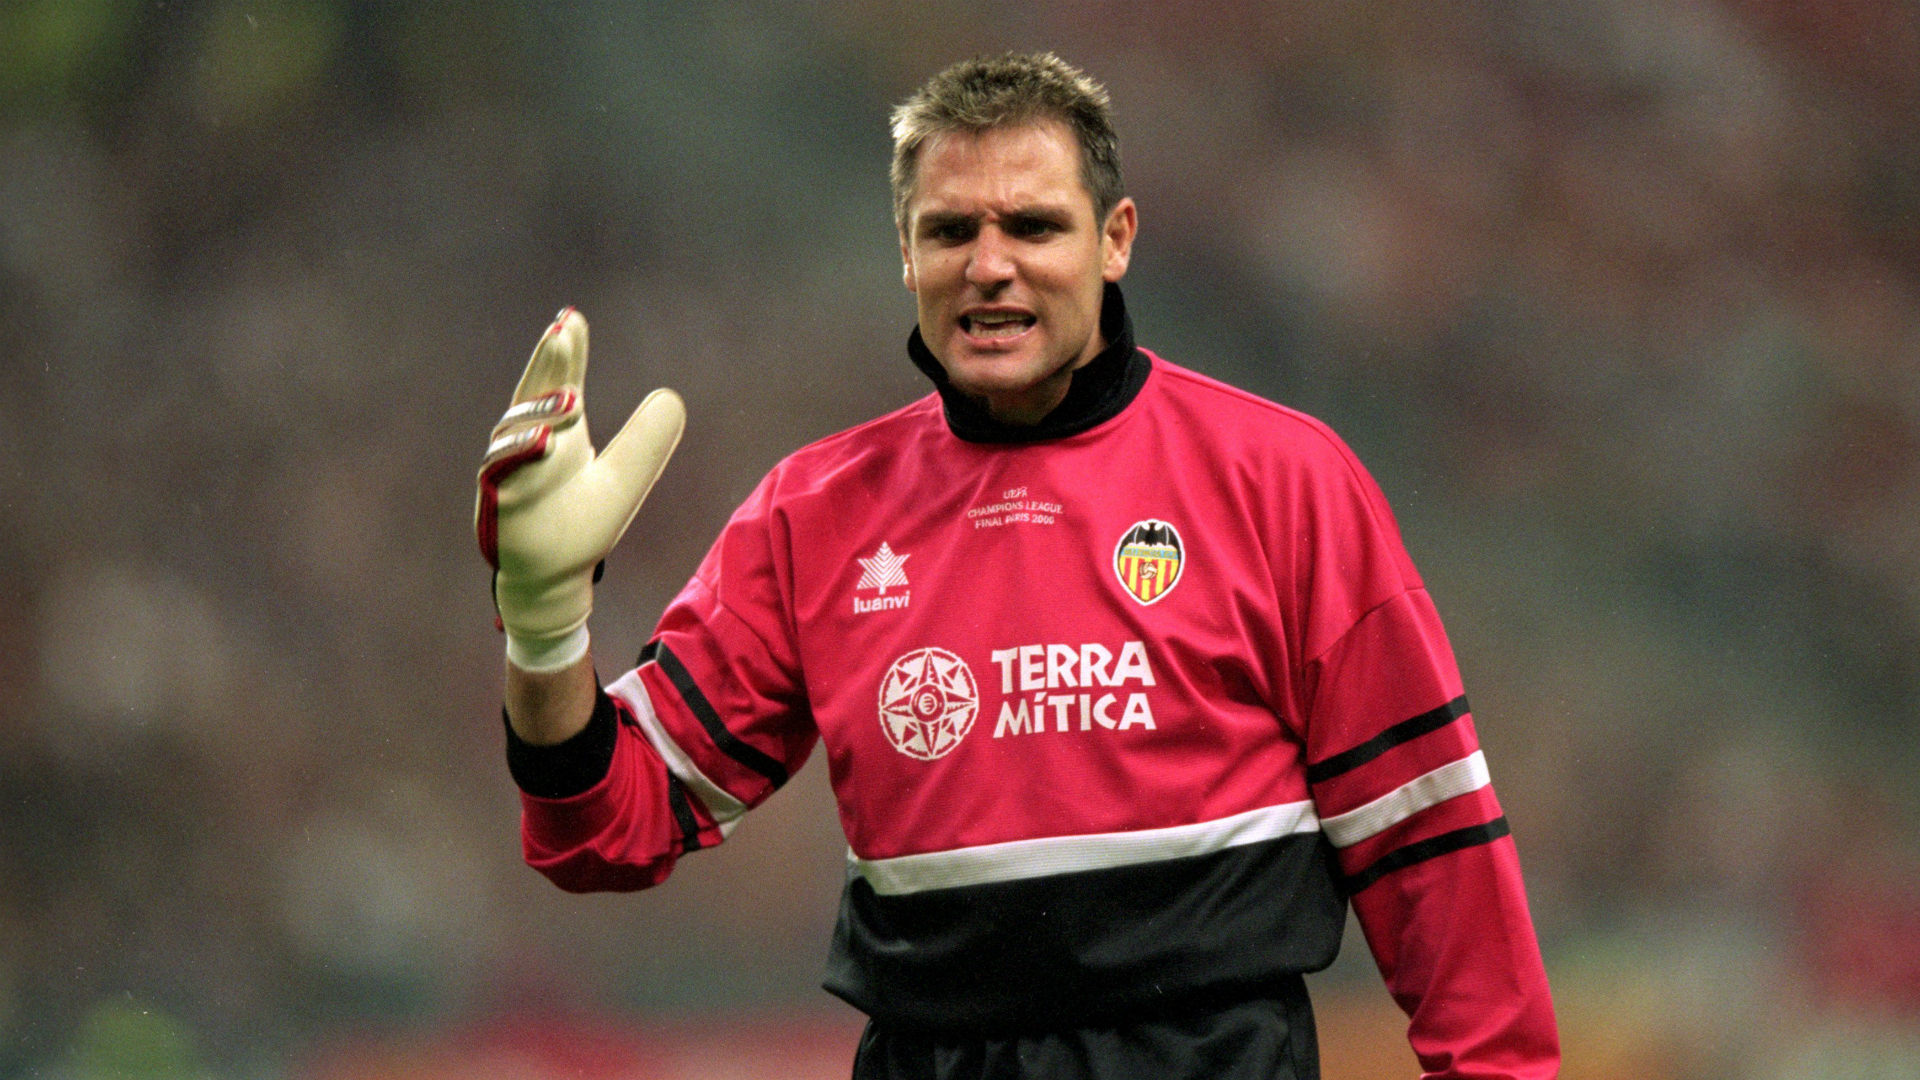 Canizares Valencia Champions League 2000